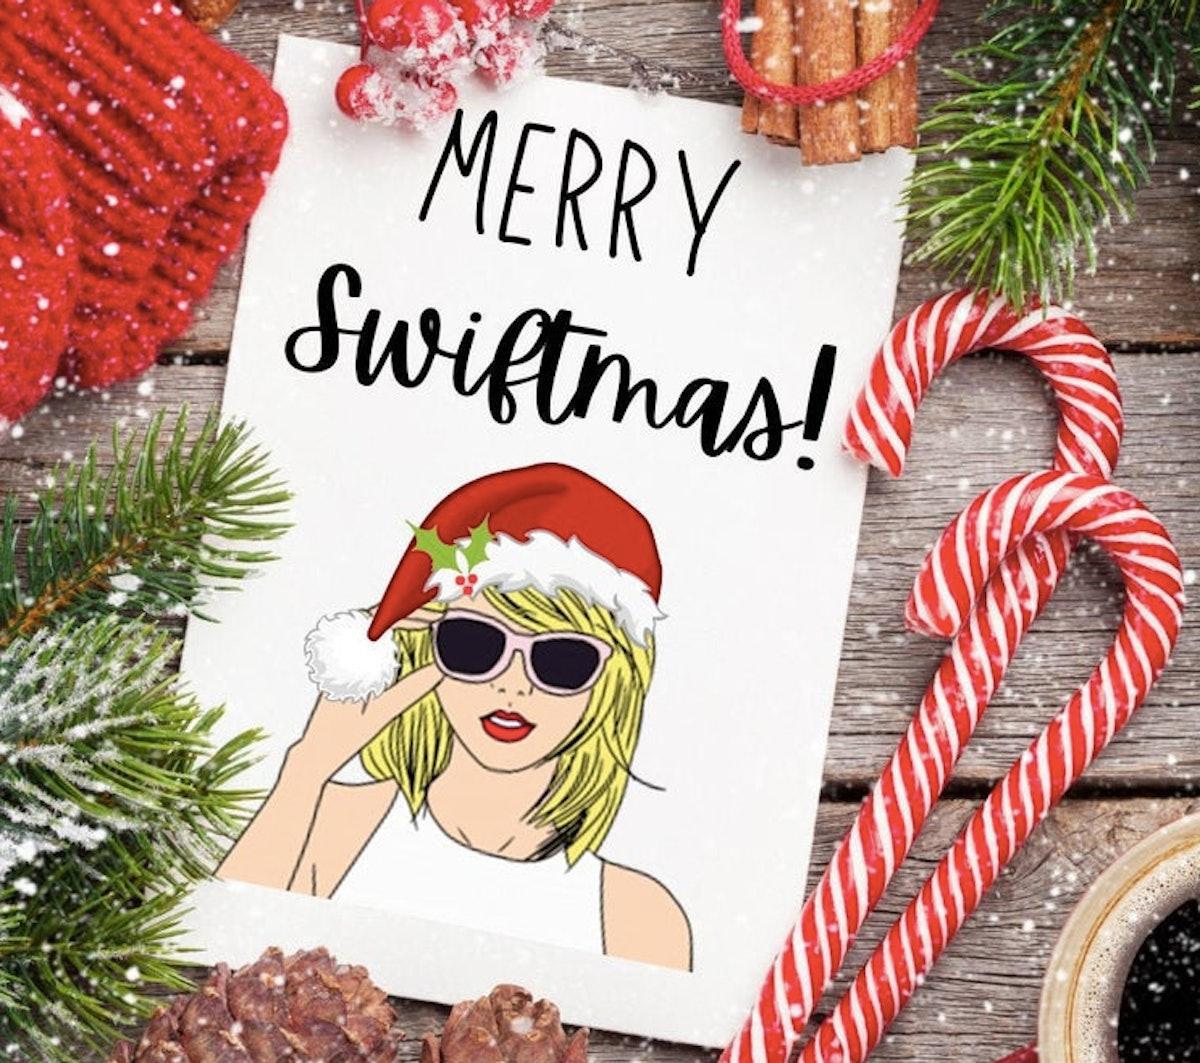 Merry Swiftmas Christmas Card - DIGITAL DOWLOAD